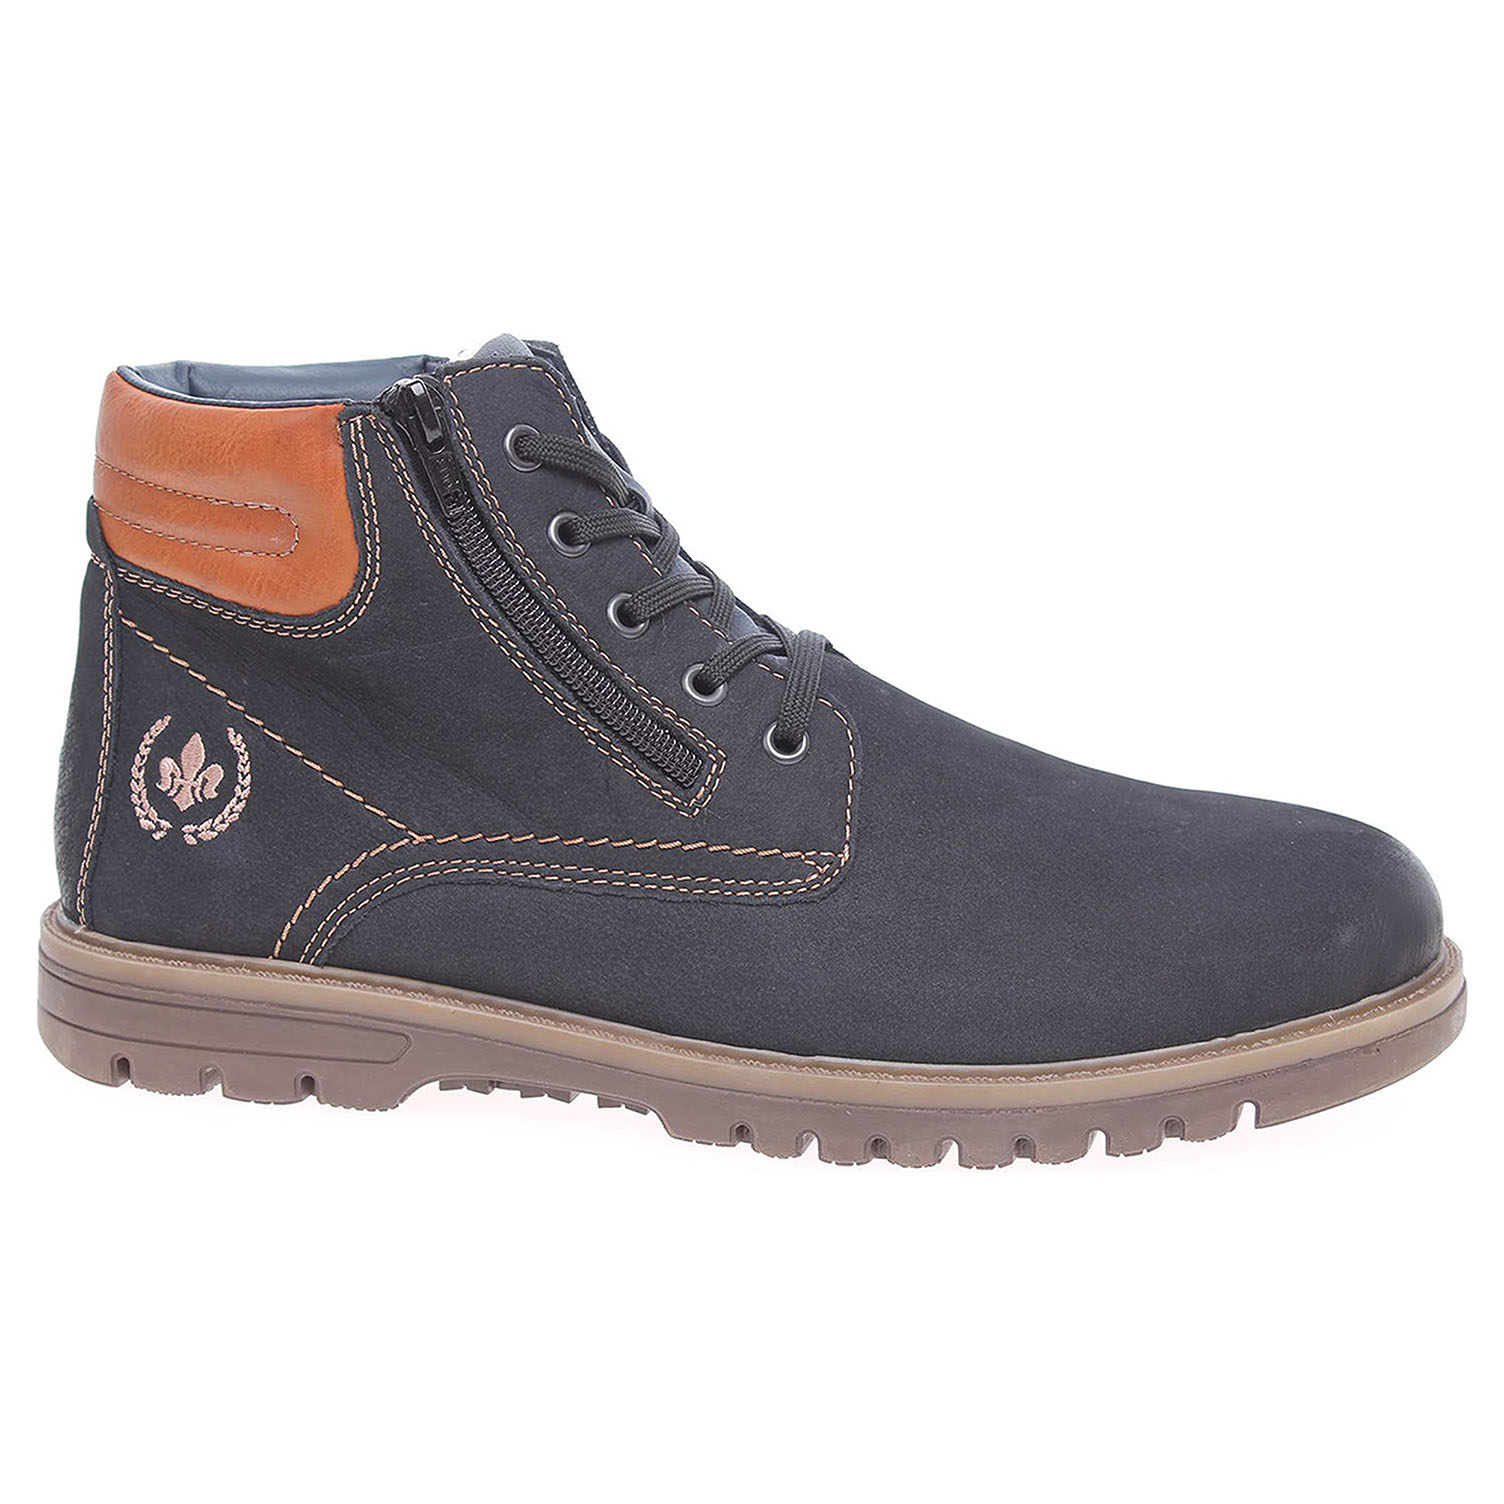 2f8e7fdad5be0 Pánská kotníková obuv Rieker F3121-14 modré | Rejnok obuv